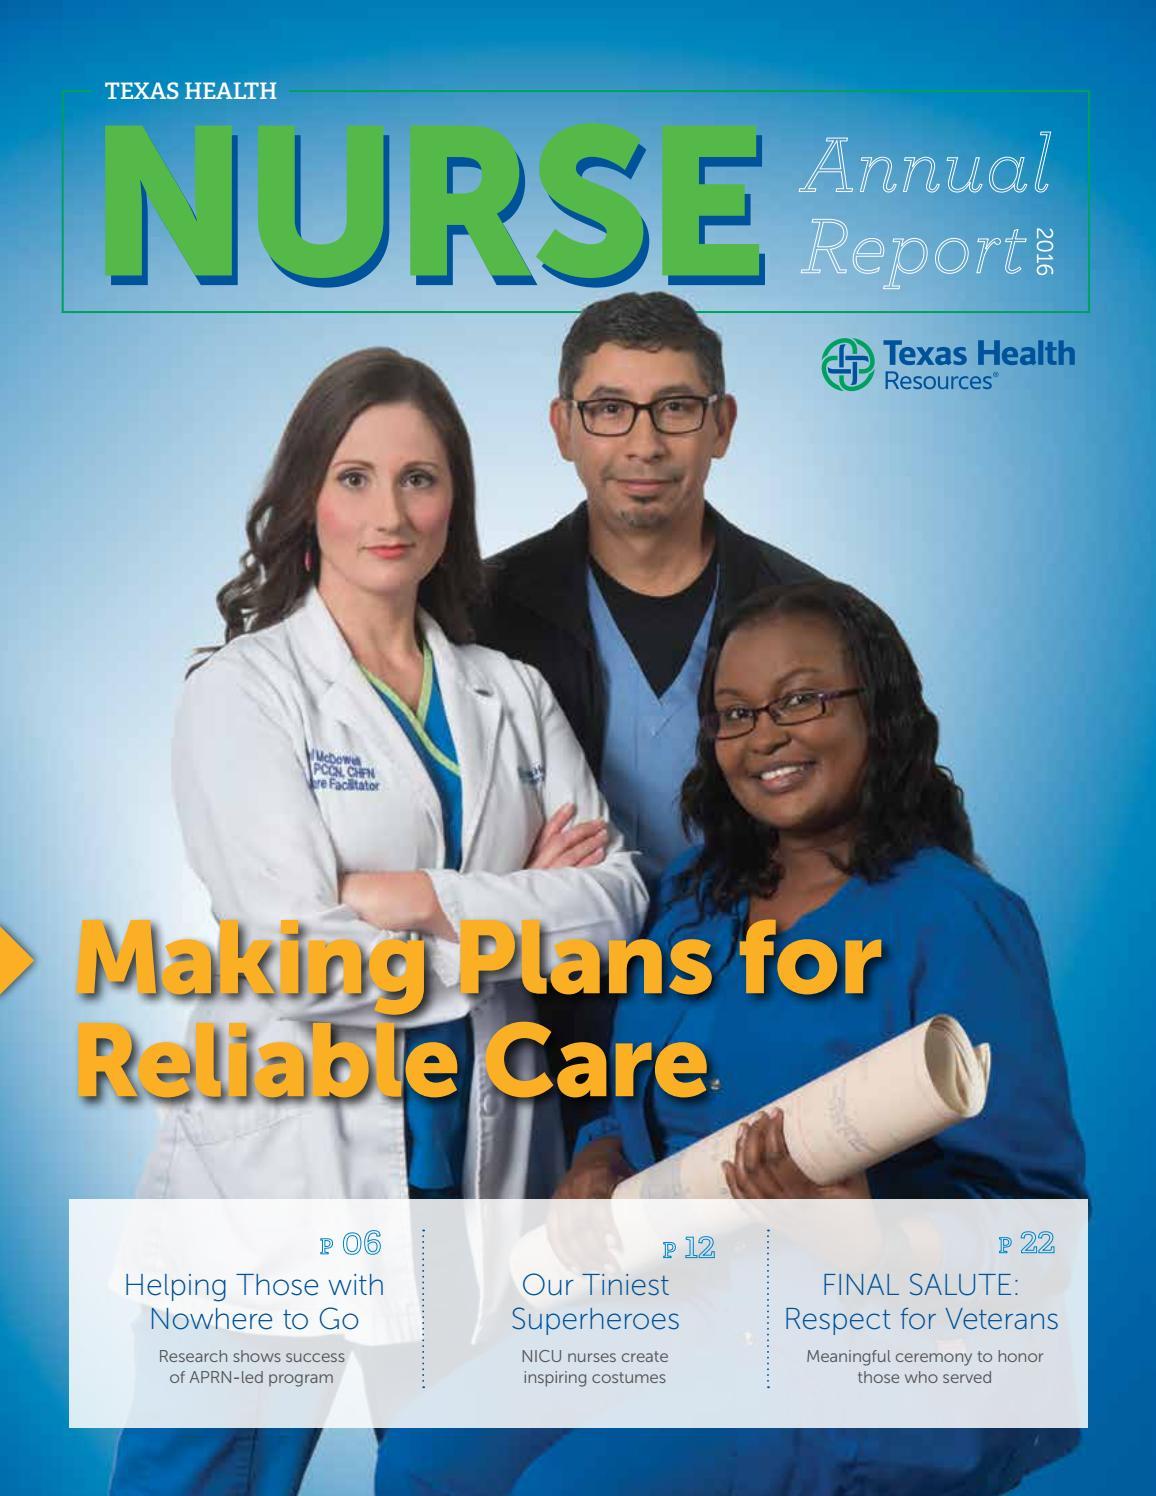 Texas Health 2016 Nurse Annual Report by THR Internal